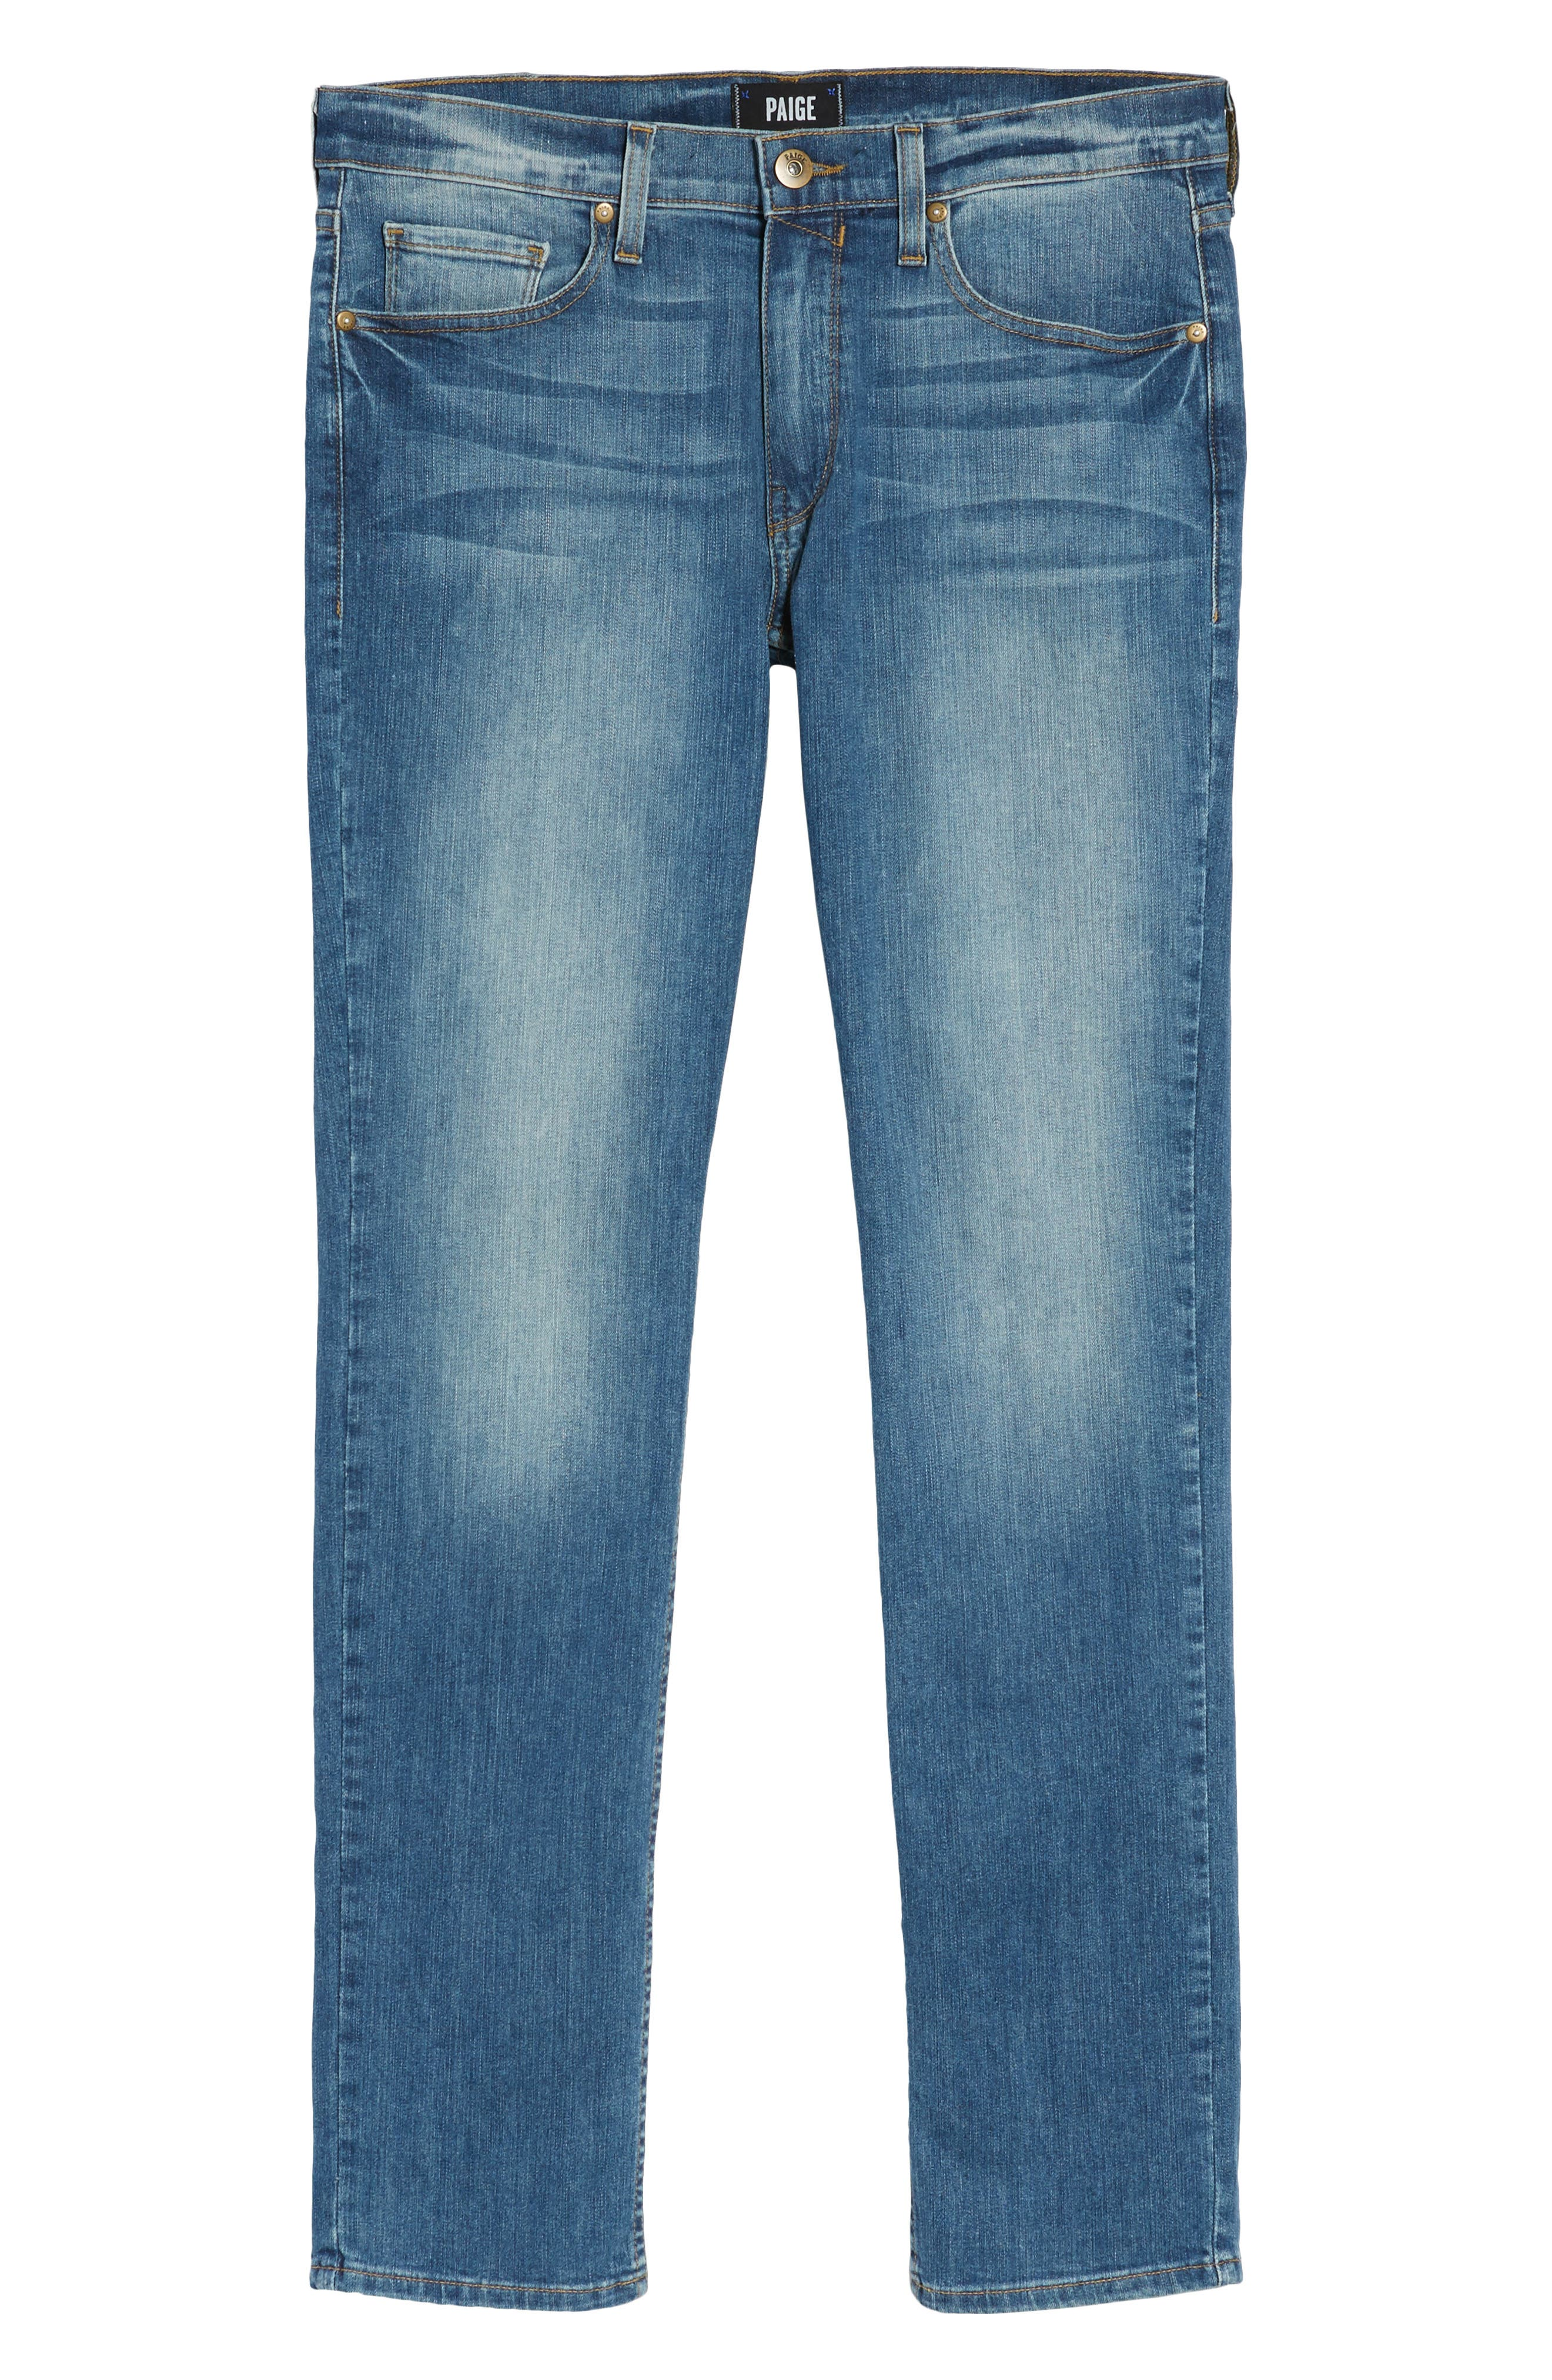 Legacy - Lennox Slim Fit Jeans,                             Alternate thumbnail 6, color,                             STEELE